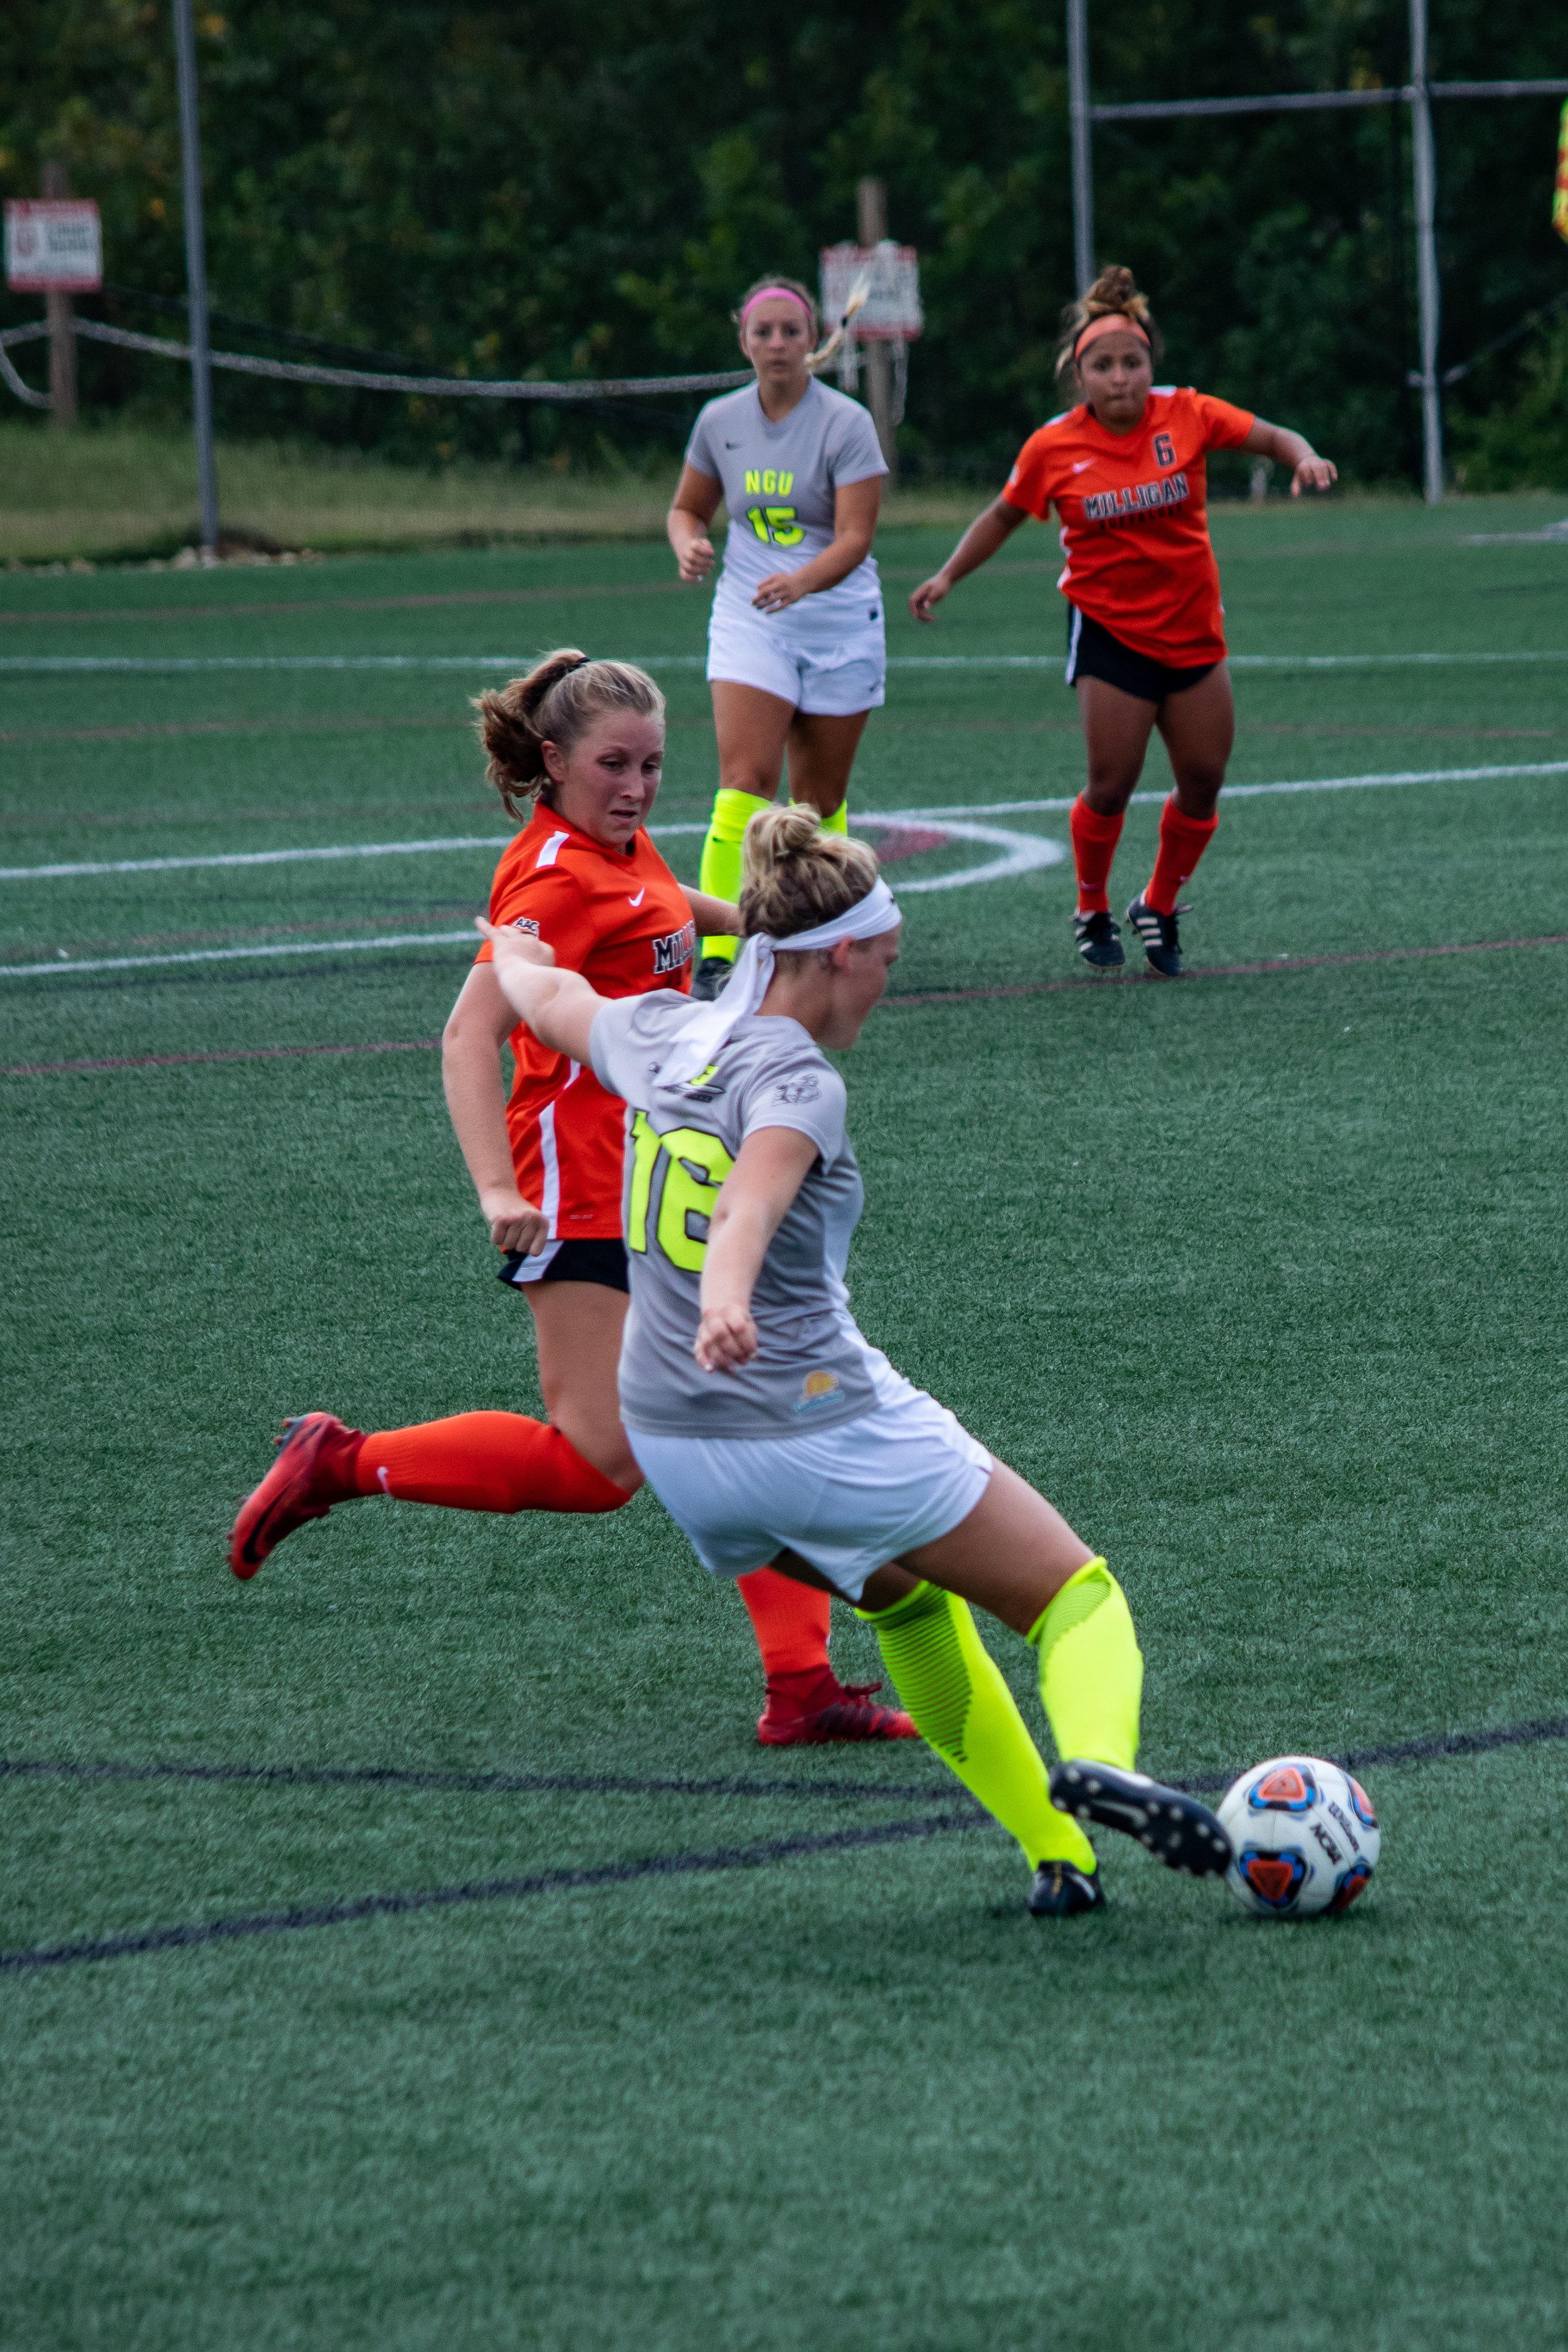 #16 Michaela Gleed prepares a strong kick to pass the ball to team member #15 Mackenzie Neff.